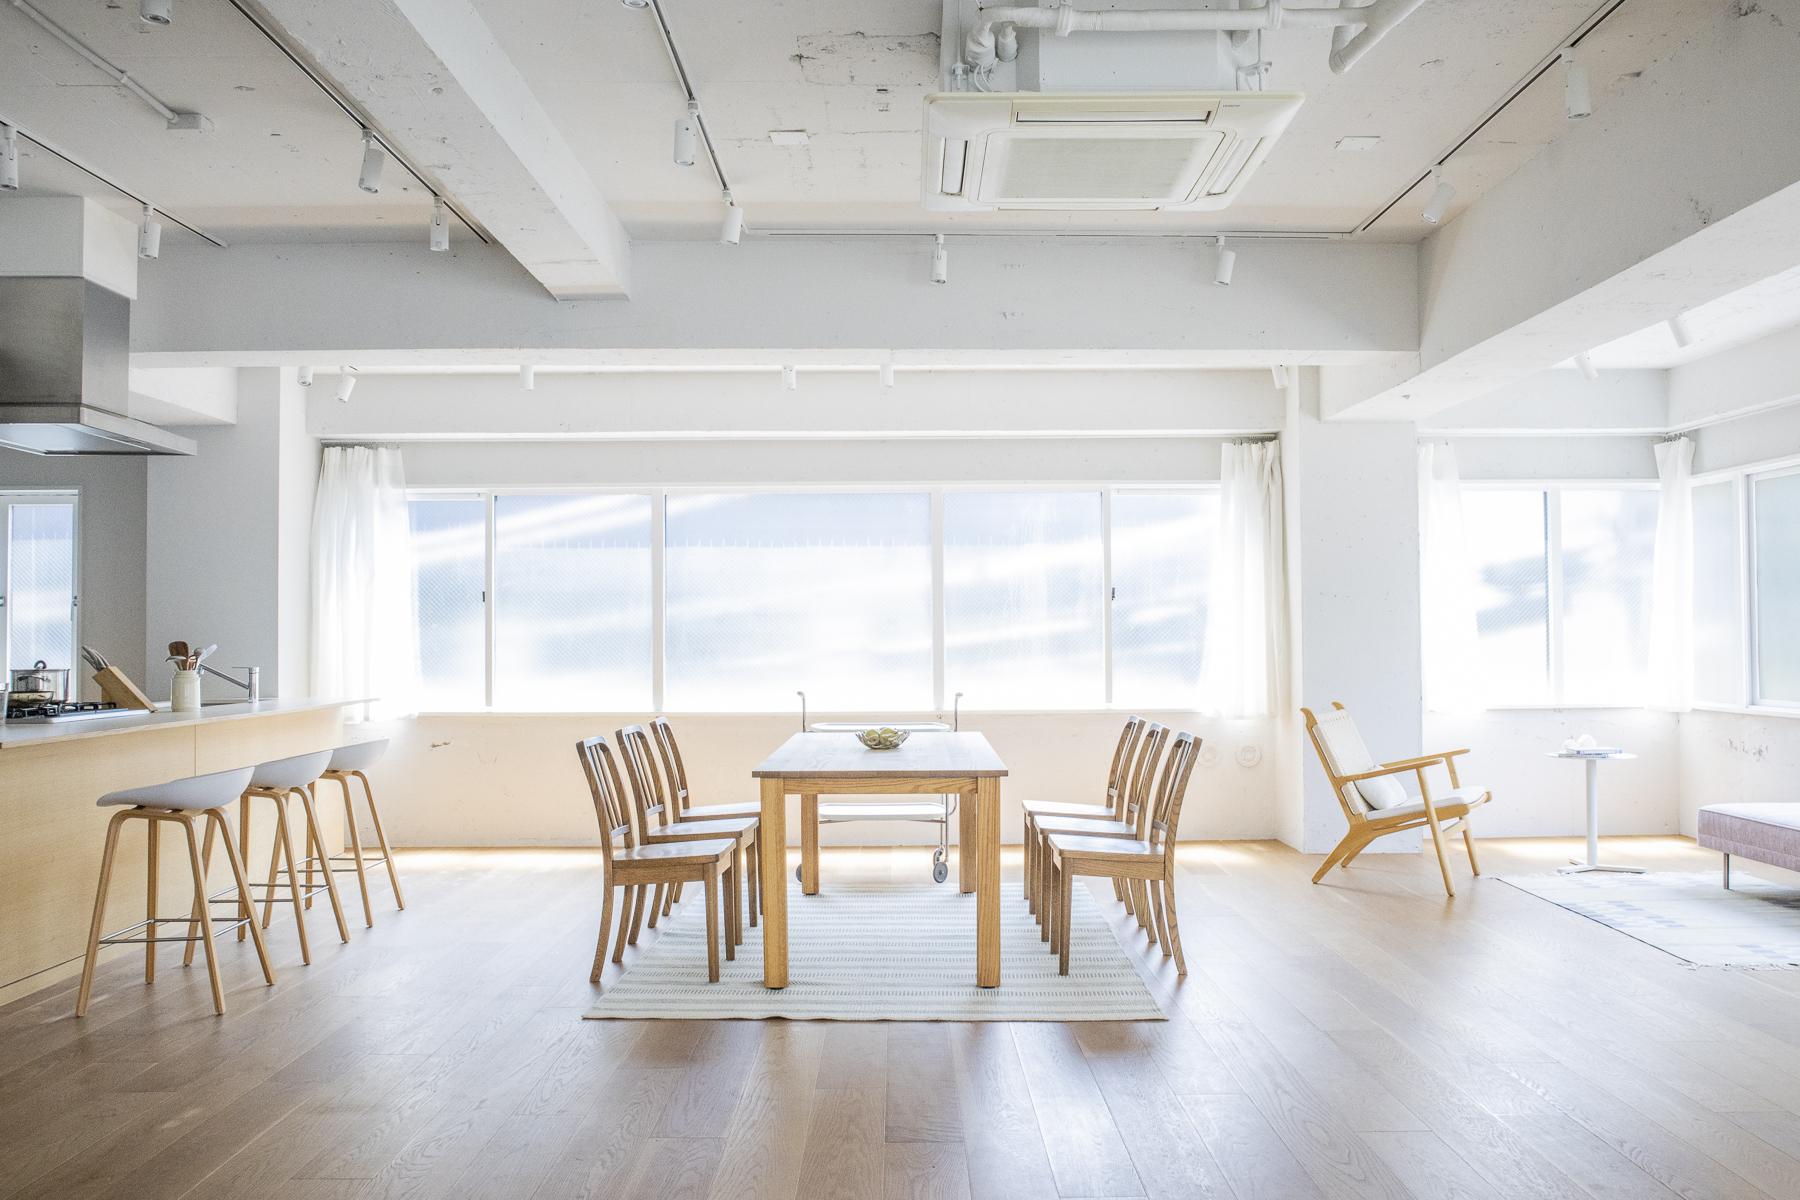 STUDIO SAND 2F (スタジオサンド2F)レンジ・オーブン機能付き